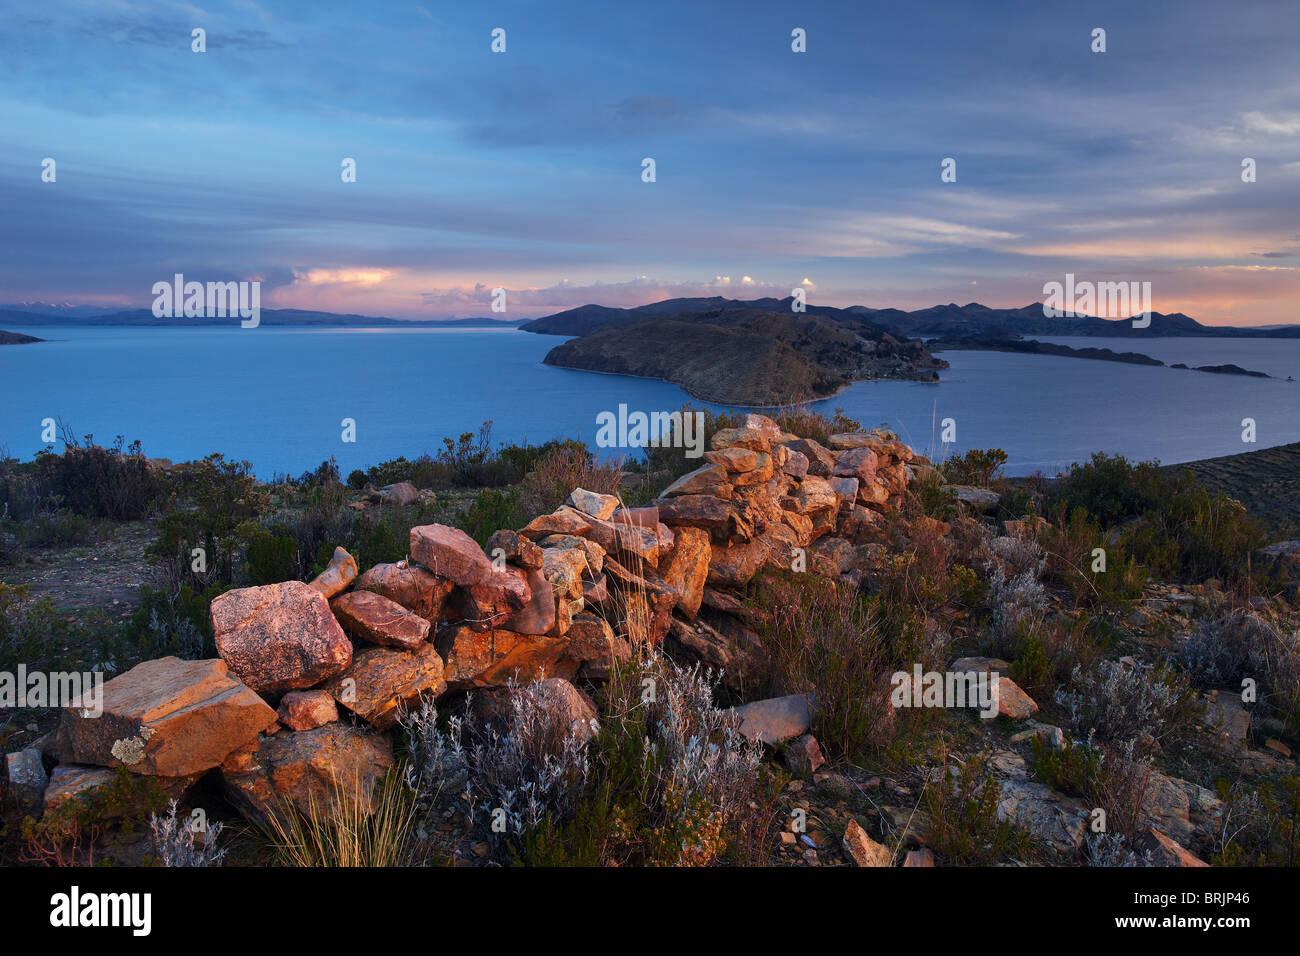 Isla del Sol, Lago Titicaca, Bolivia Imagen De Stock